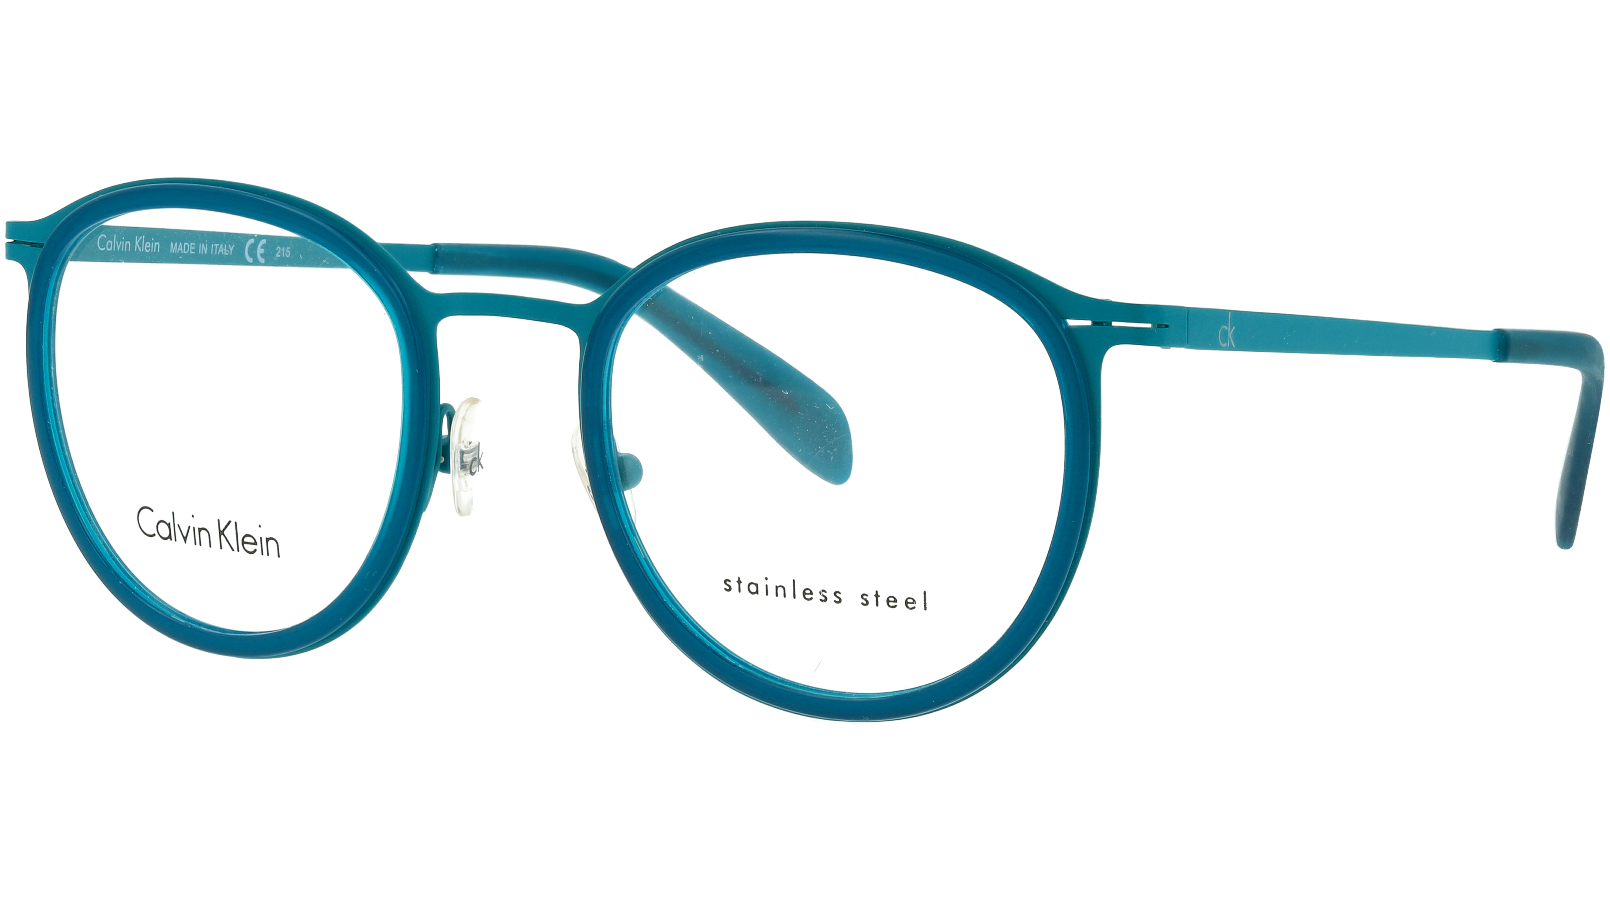 Calvin Klein CK5415 330 49 Green Glasses